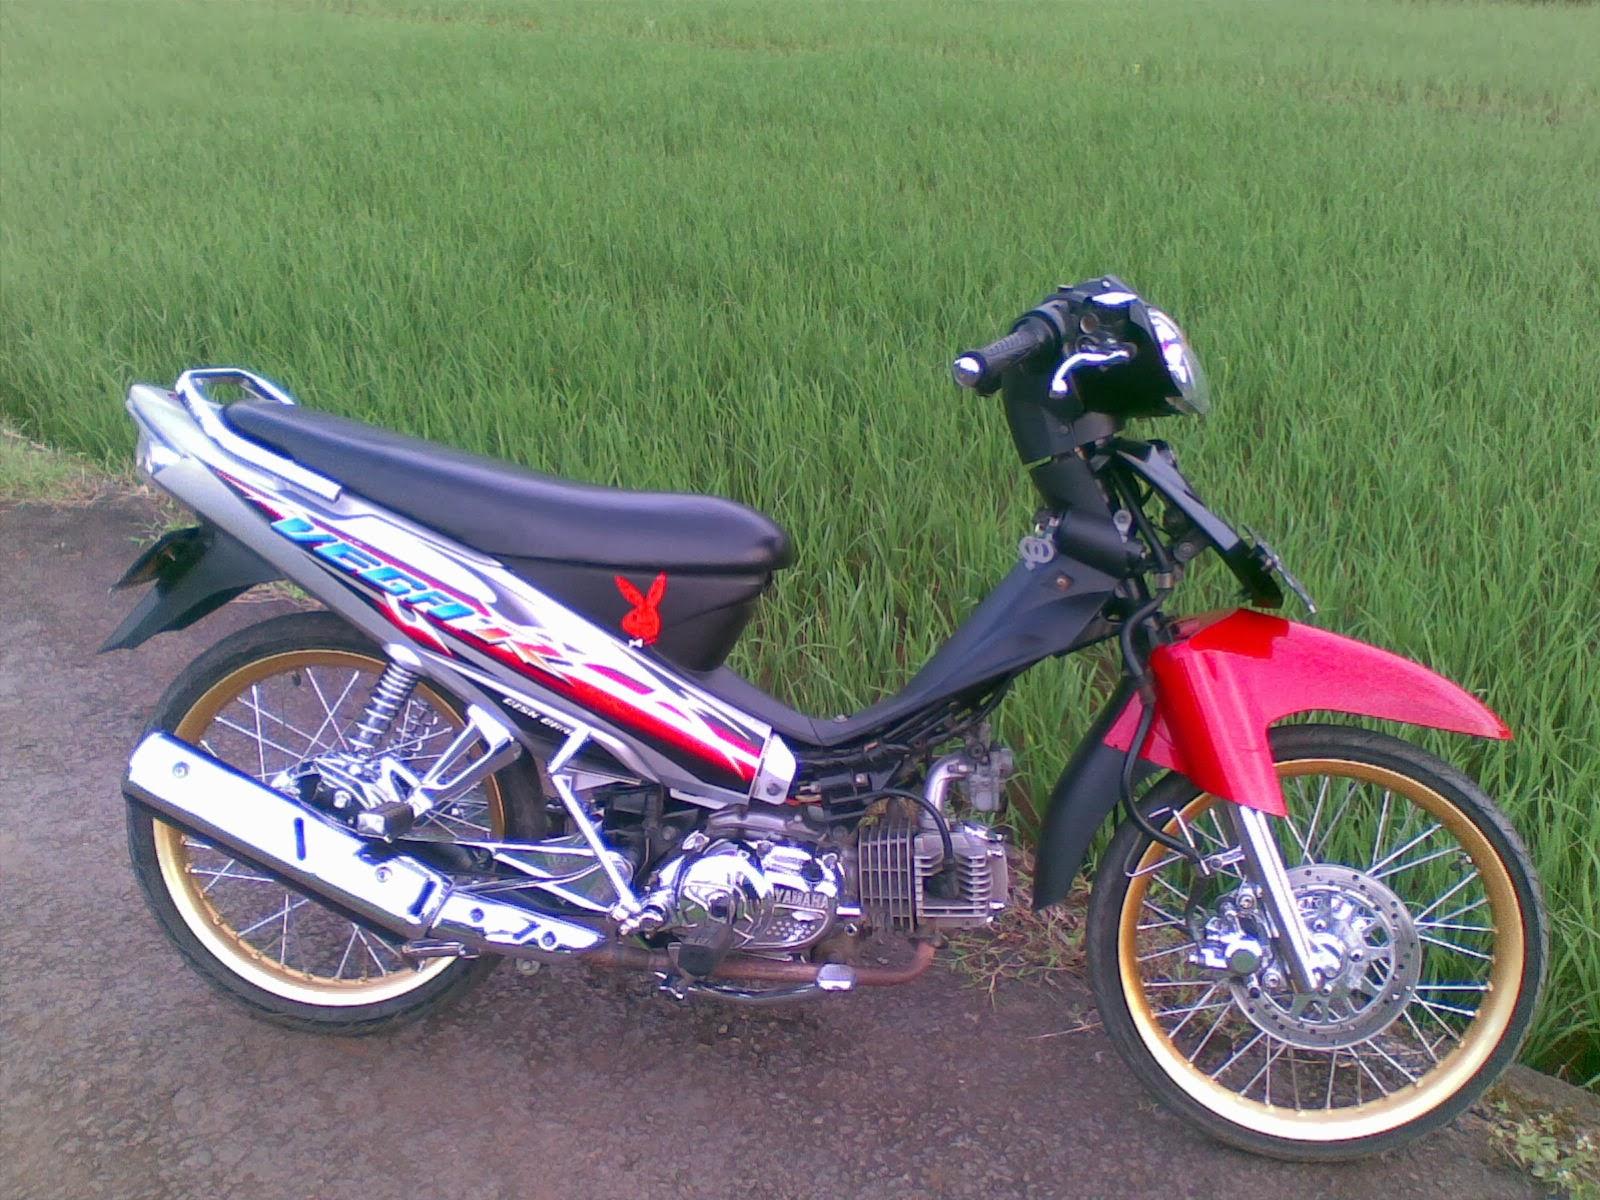 Modifikasi Motor Yamaha Vega R Dan Vega Zr Dan Berikut Gambar Short